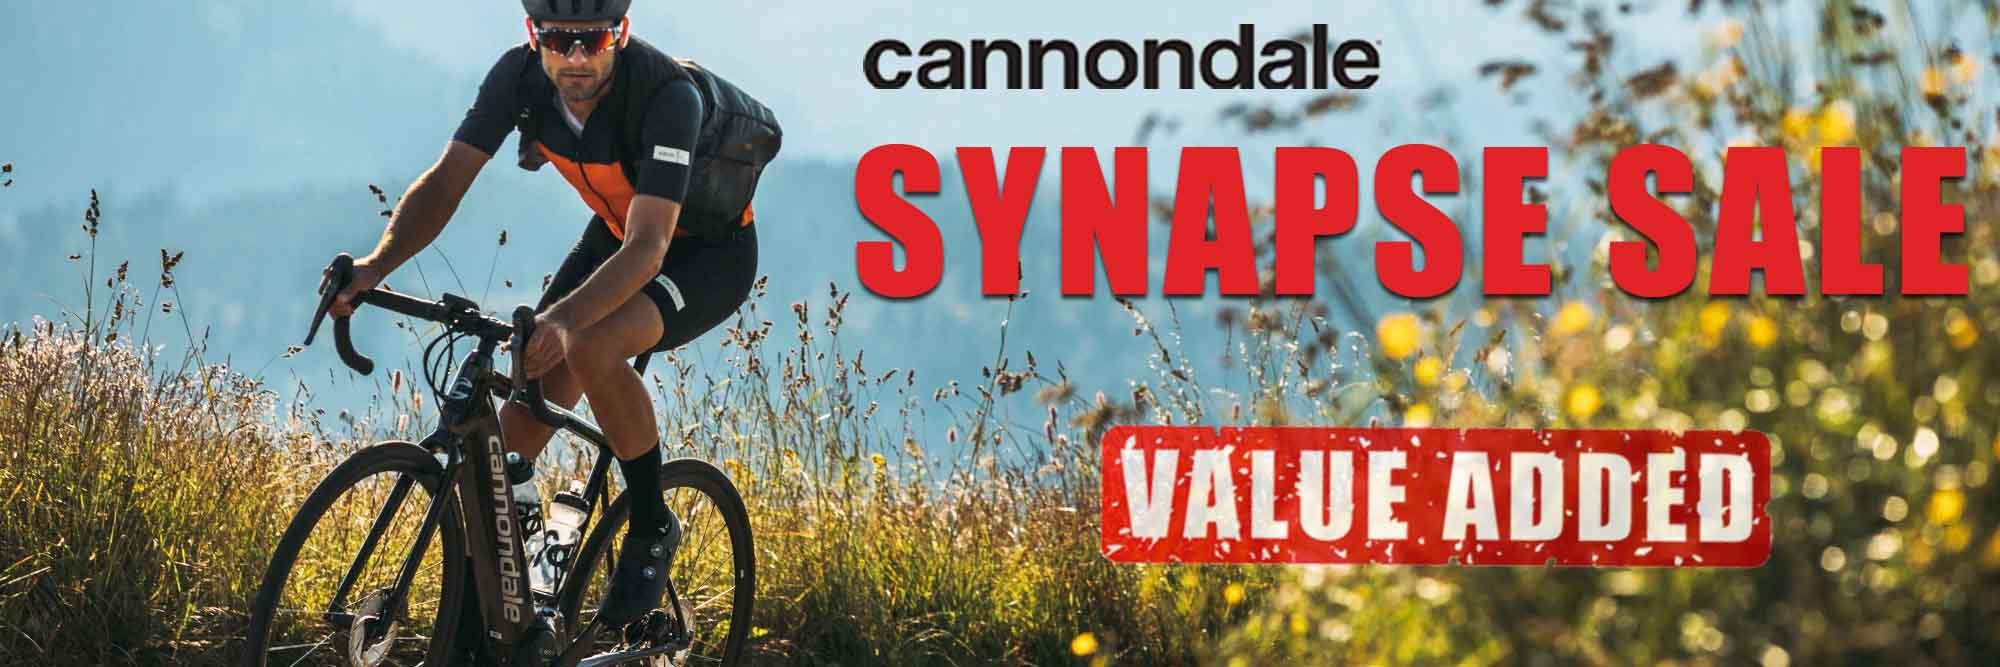 Cannondale Synapse Bike Sale